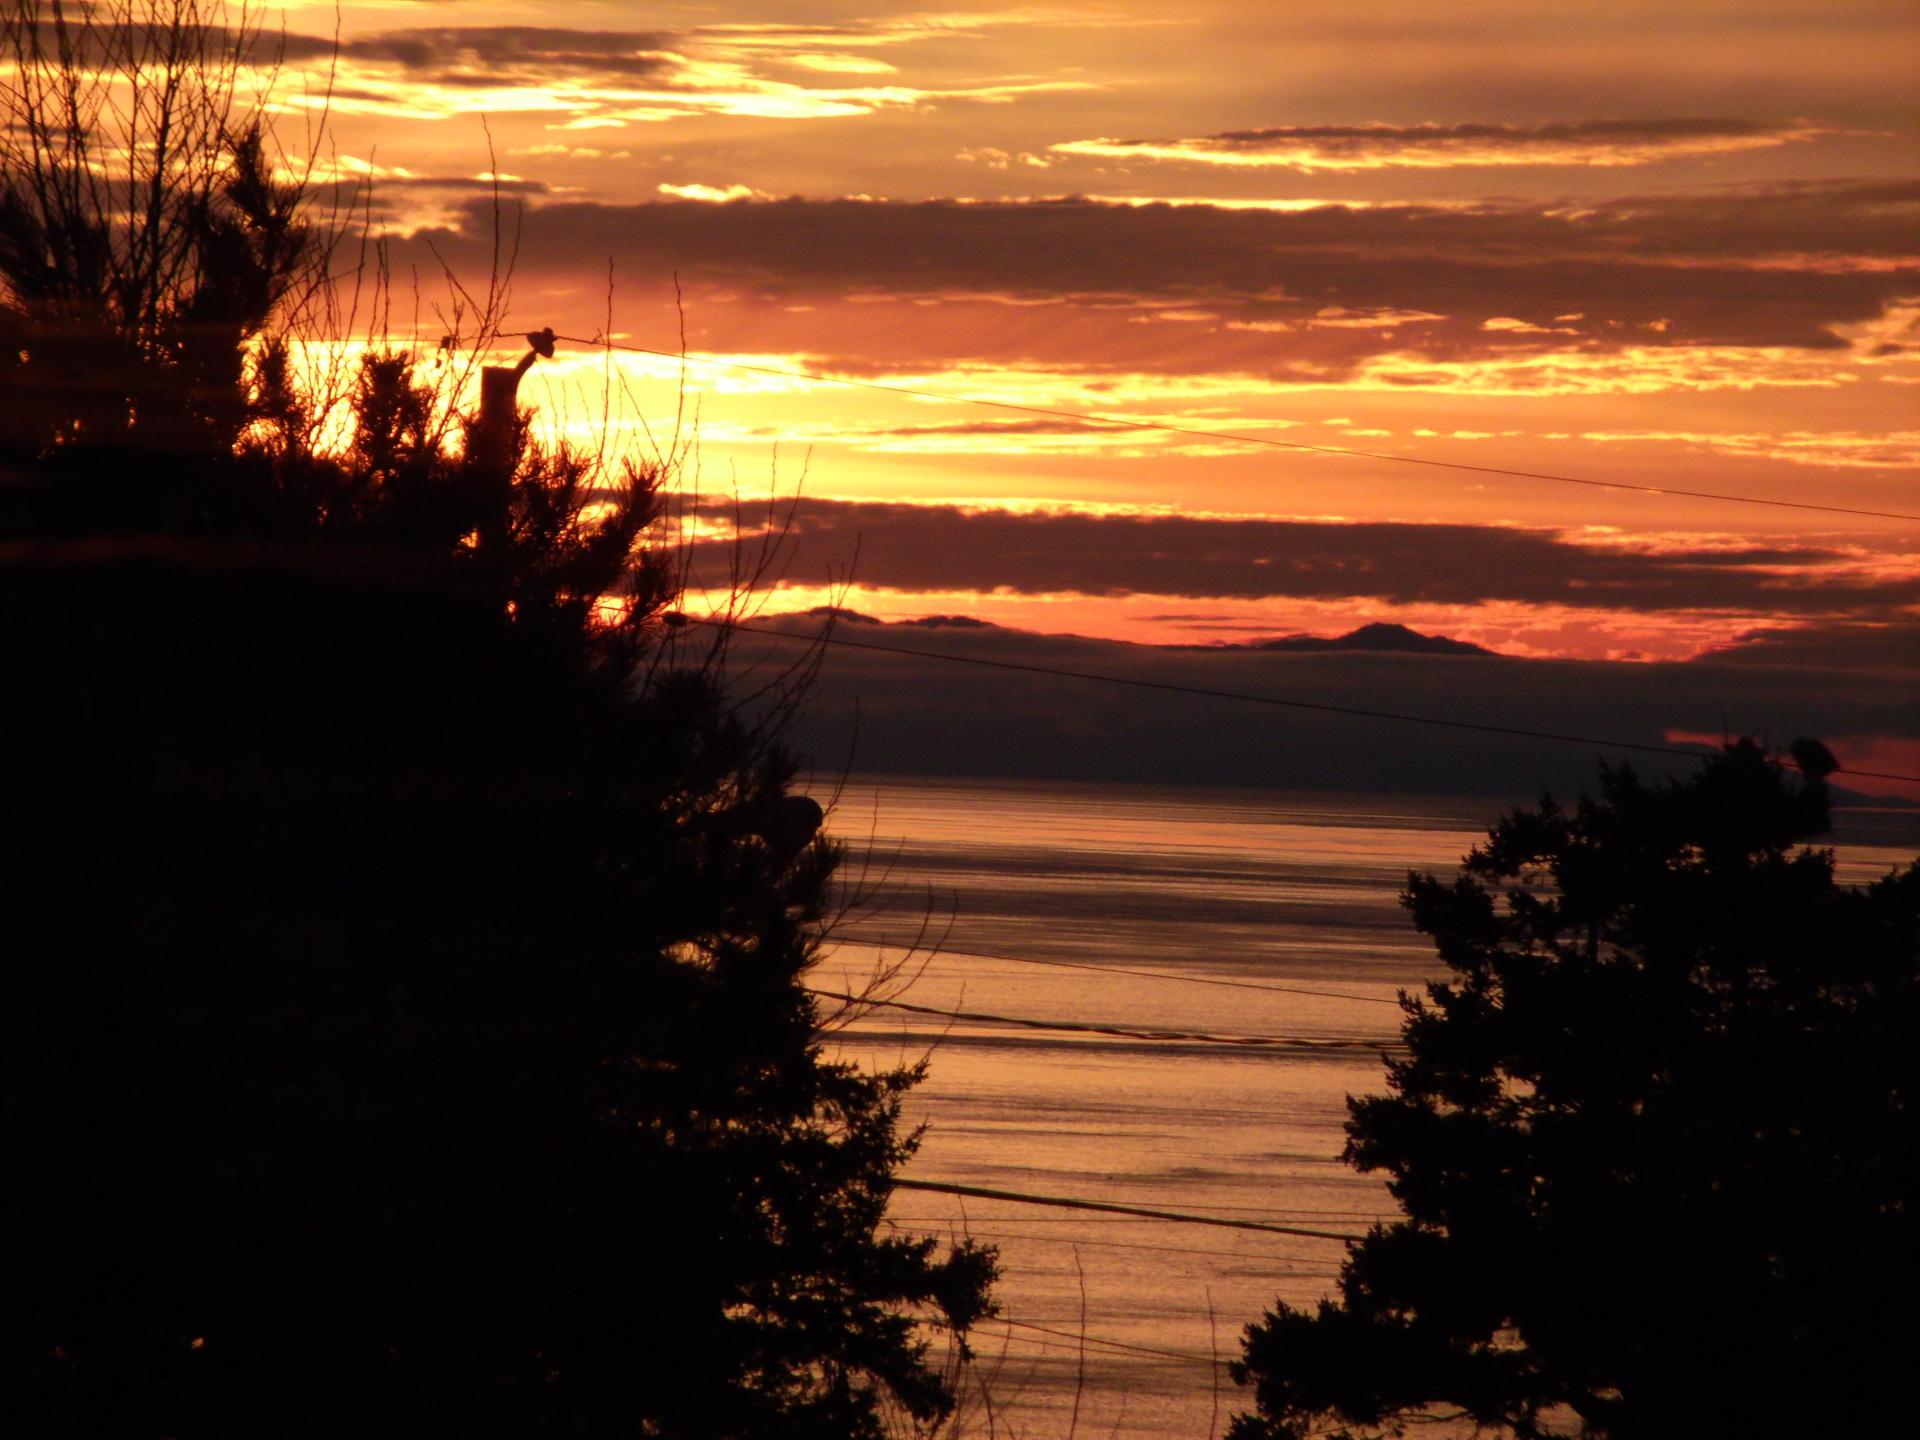 Campbell River, B.C. sunrise